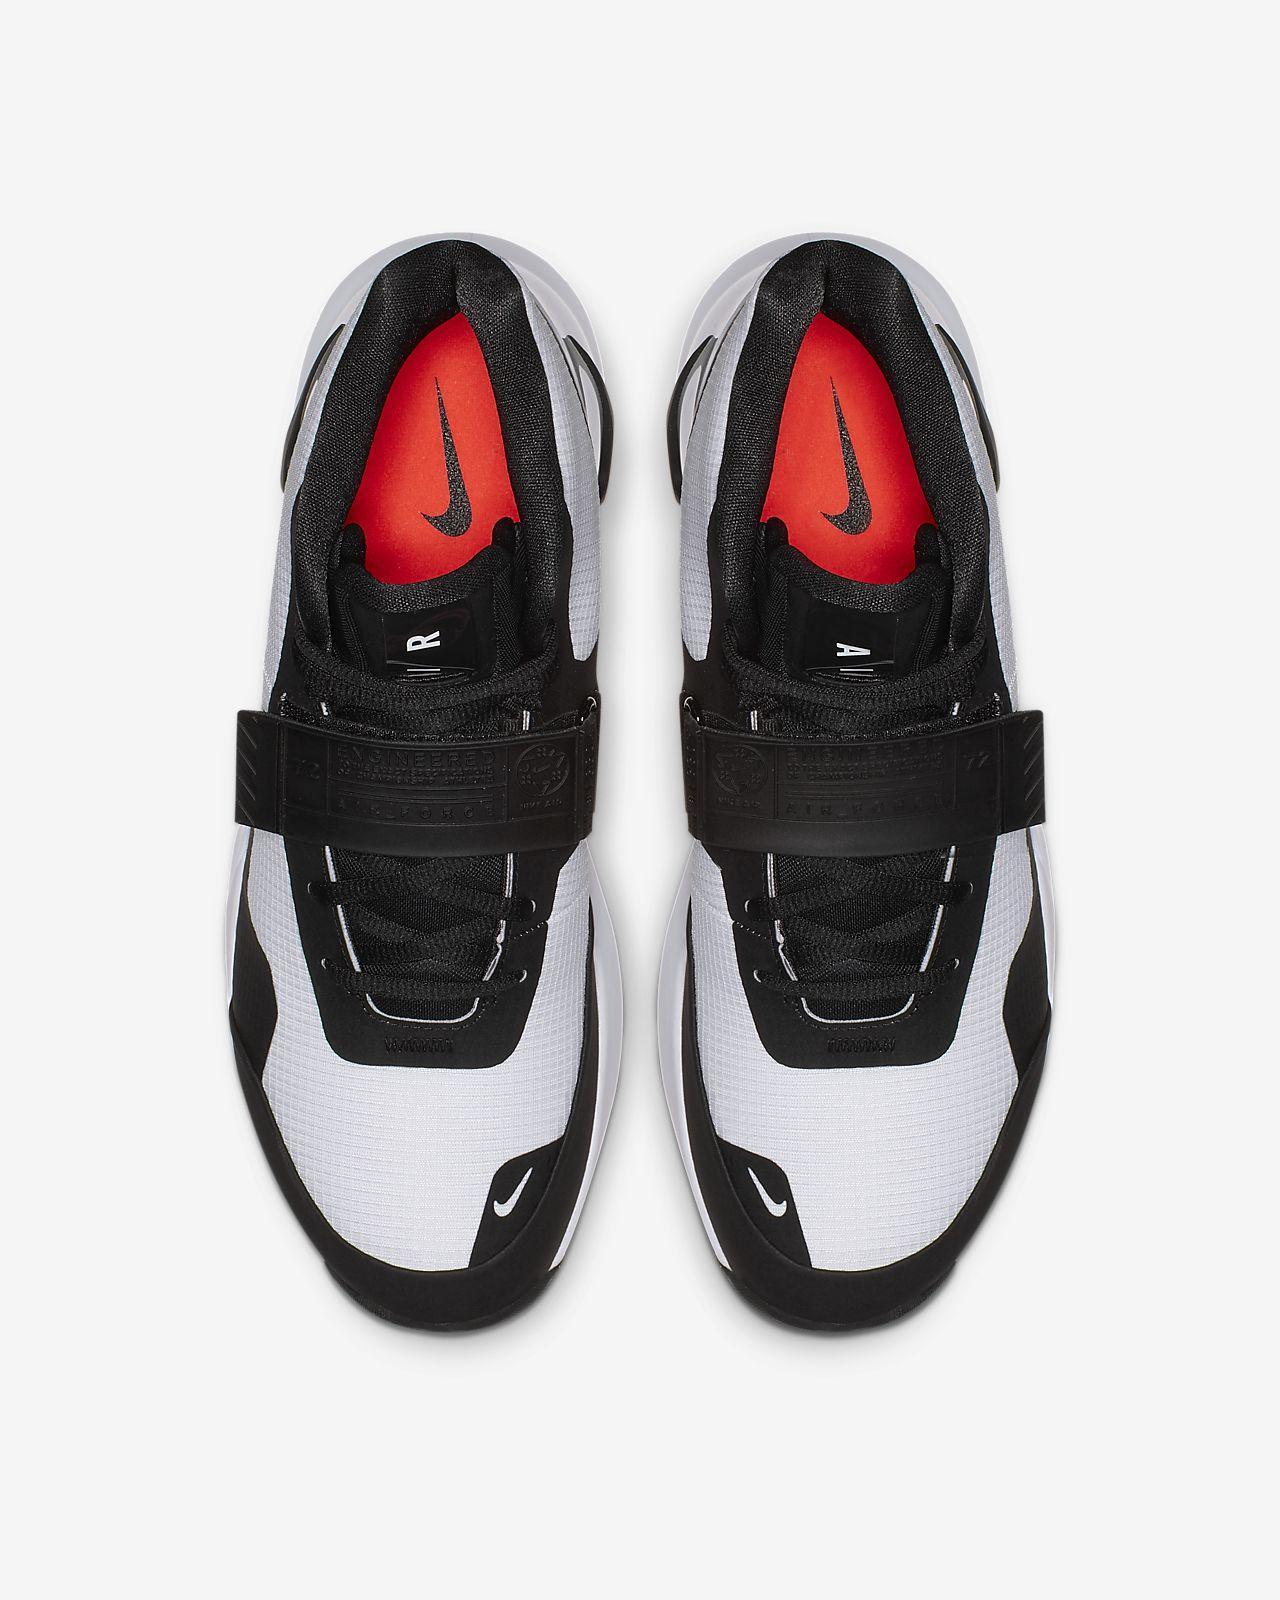 Nike Air Force Max Basketball Shoe